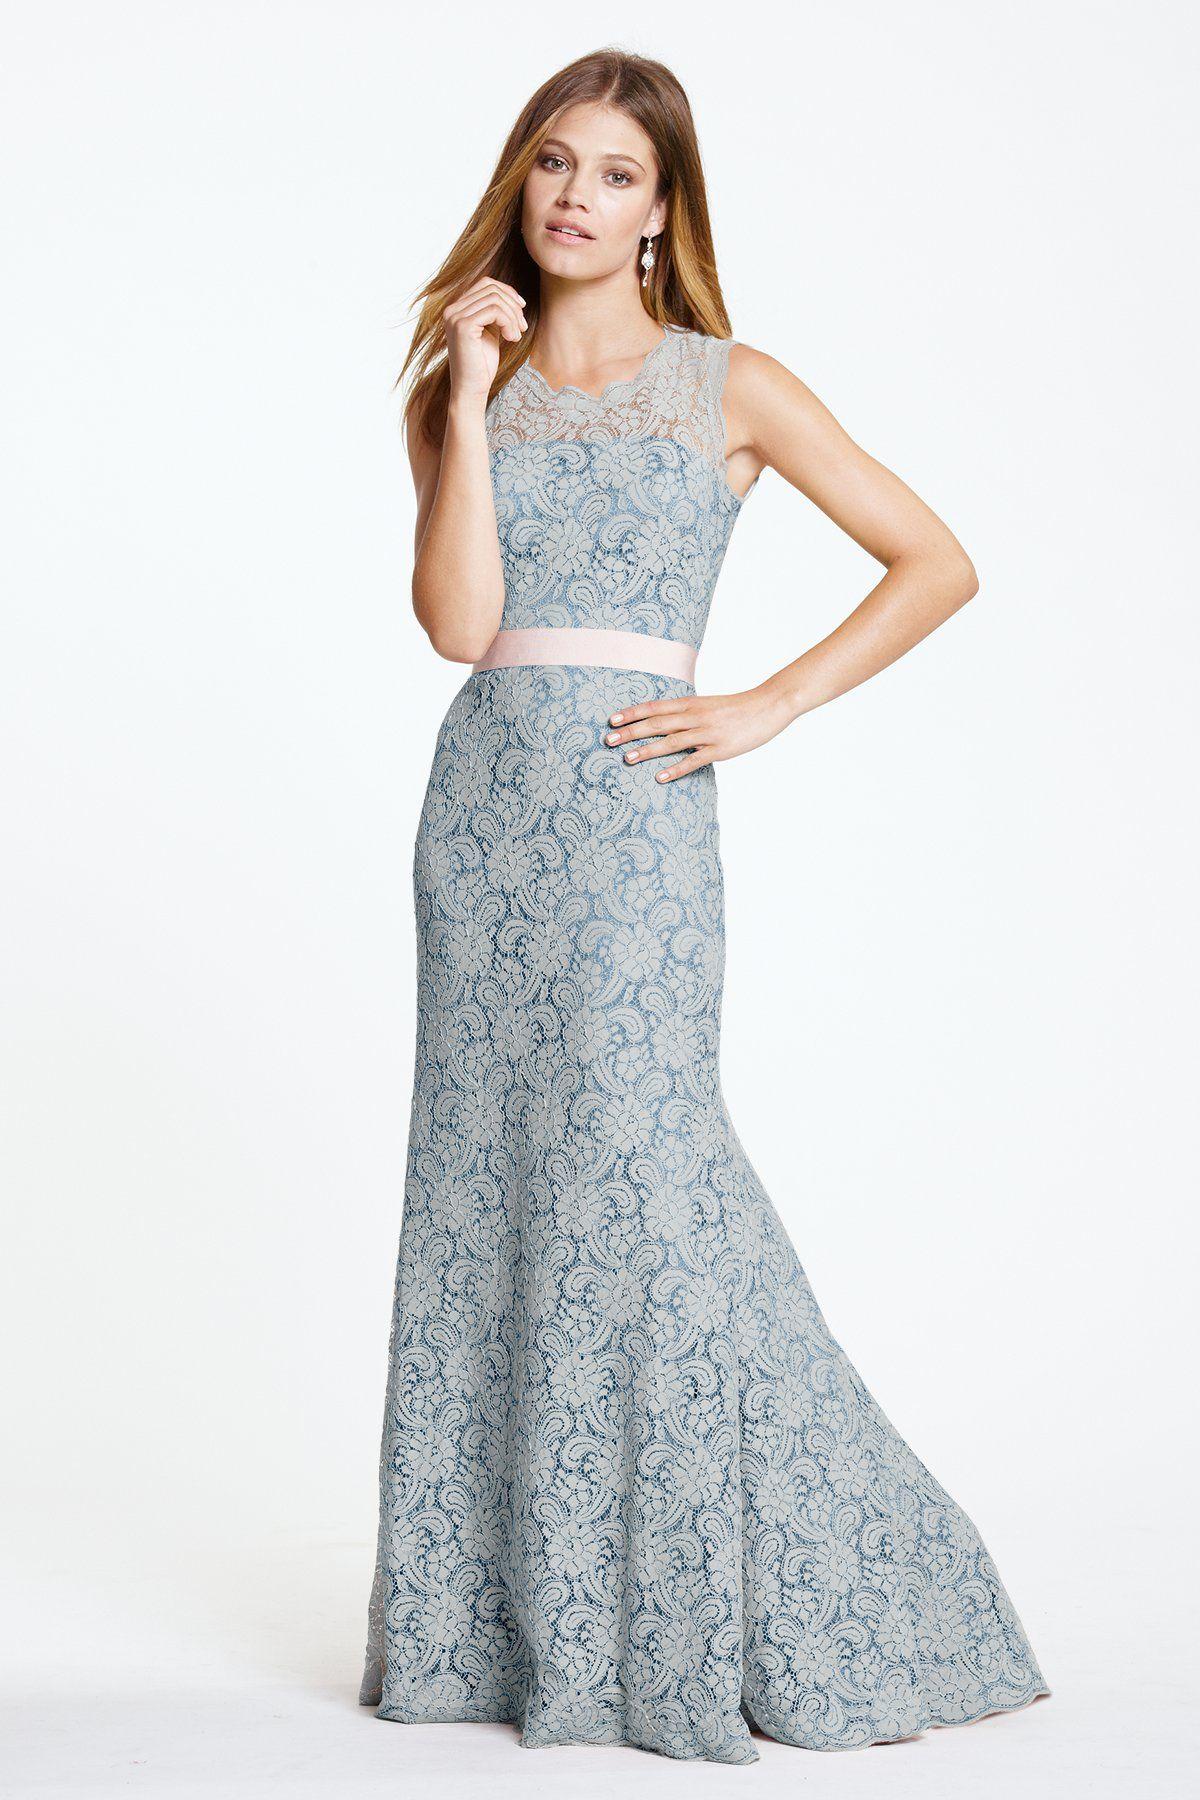 Watters Andrea Bridesmaid Dress Weddington Way Rose